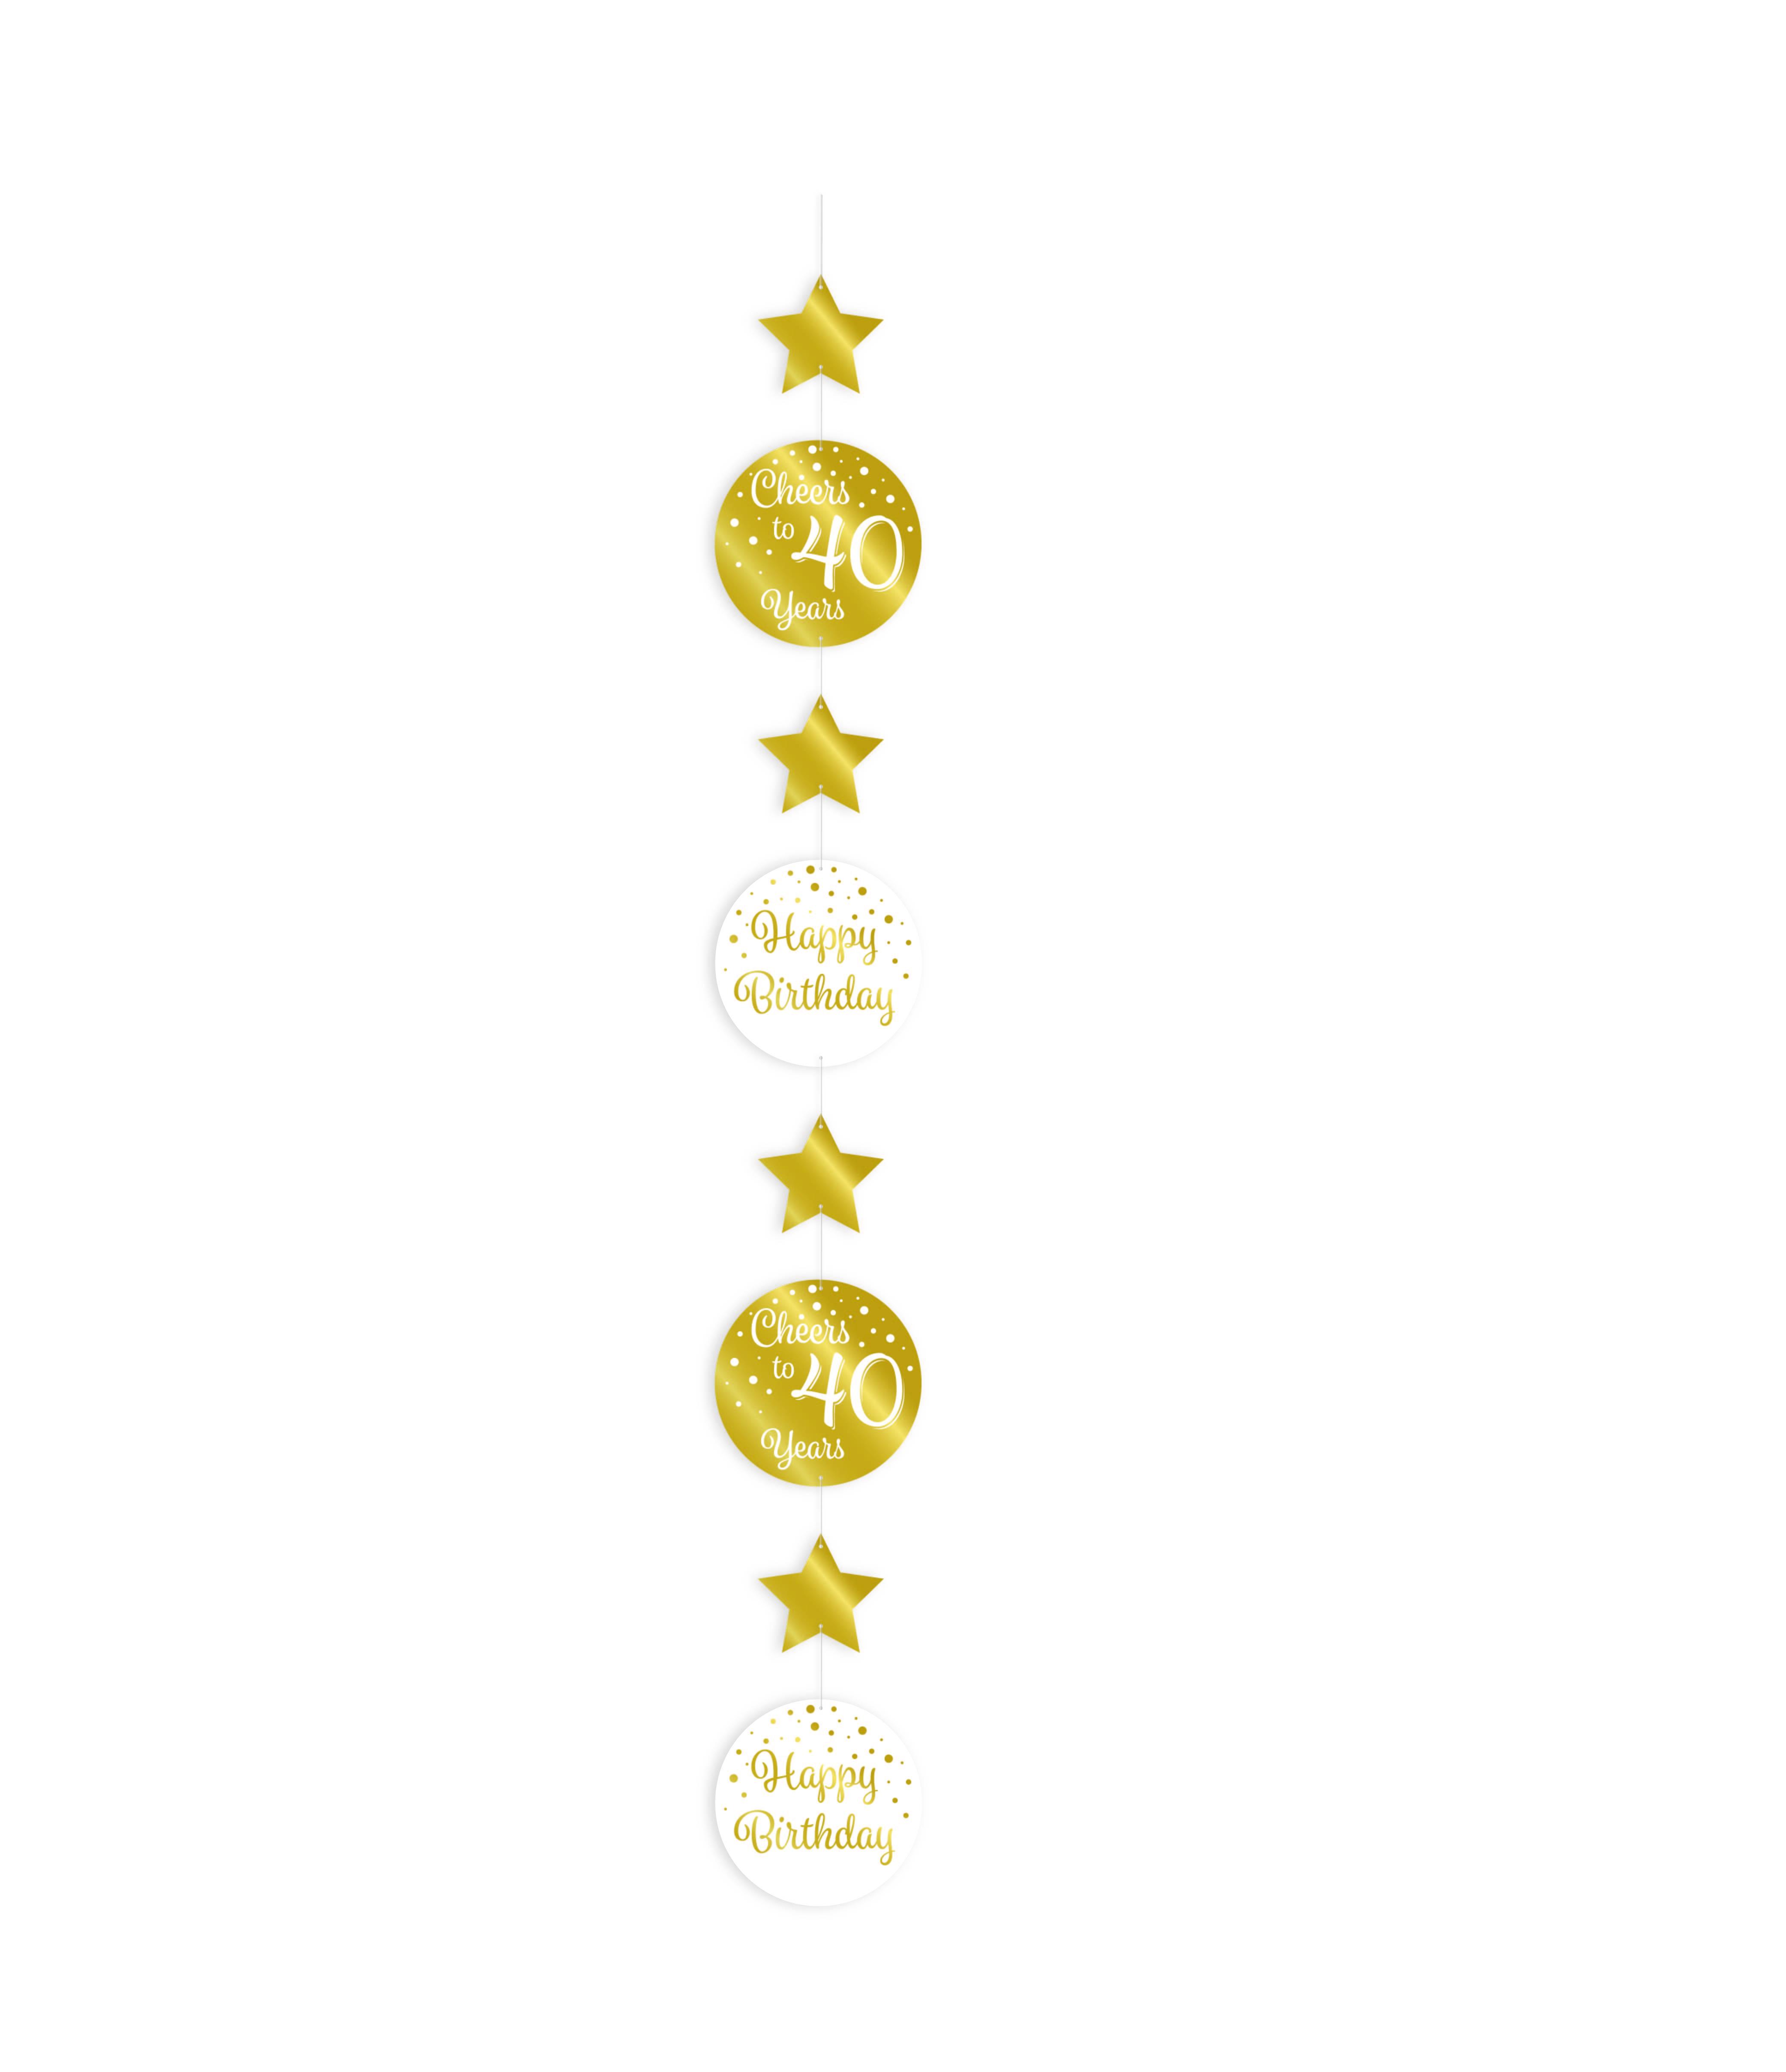 Hangdecoratie Goud/Wit Cheers to 40 Years